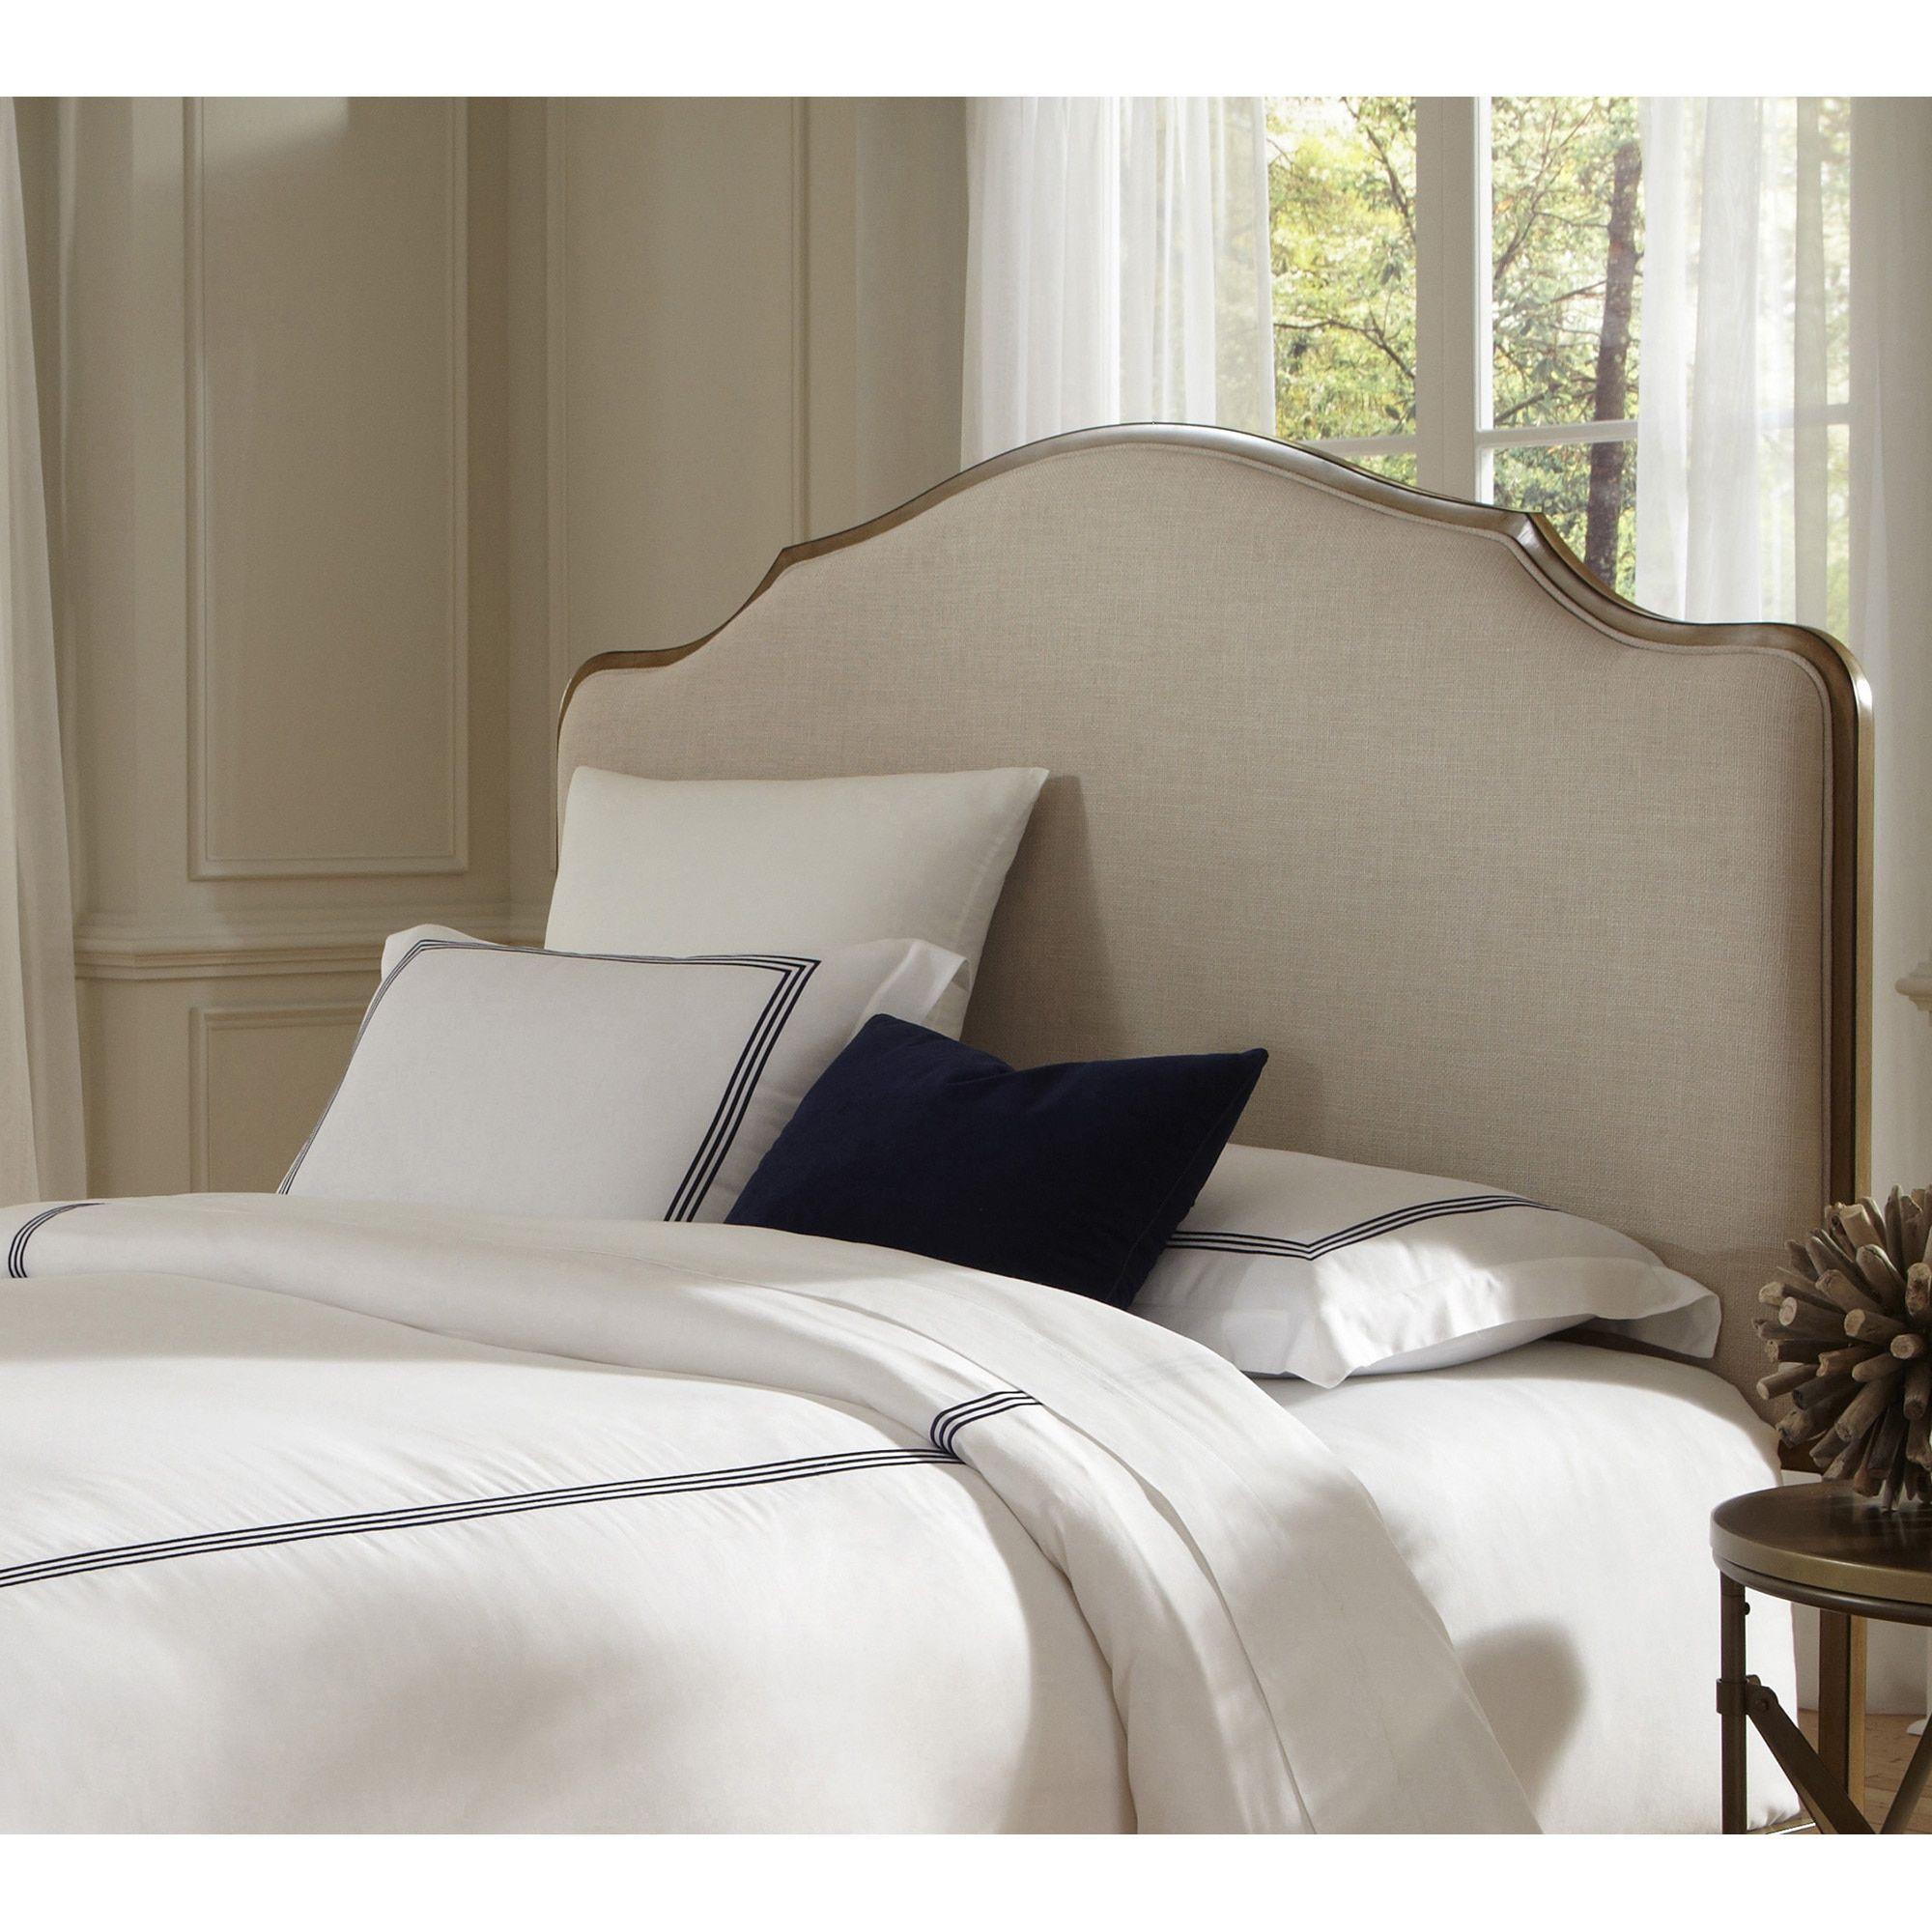 Fashion bed group calvados metal grey headboard in natural oak